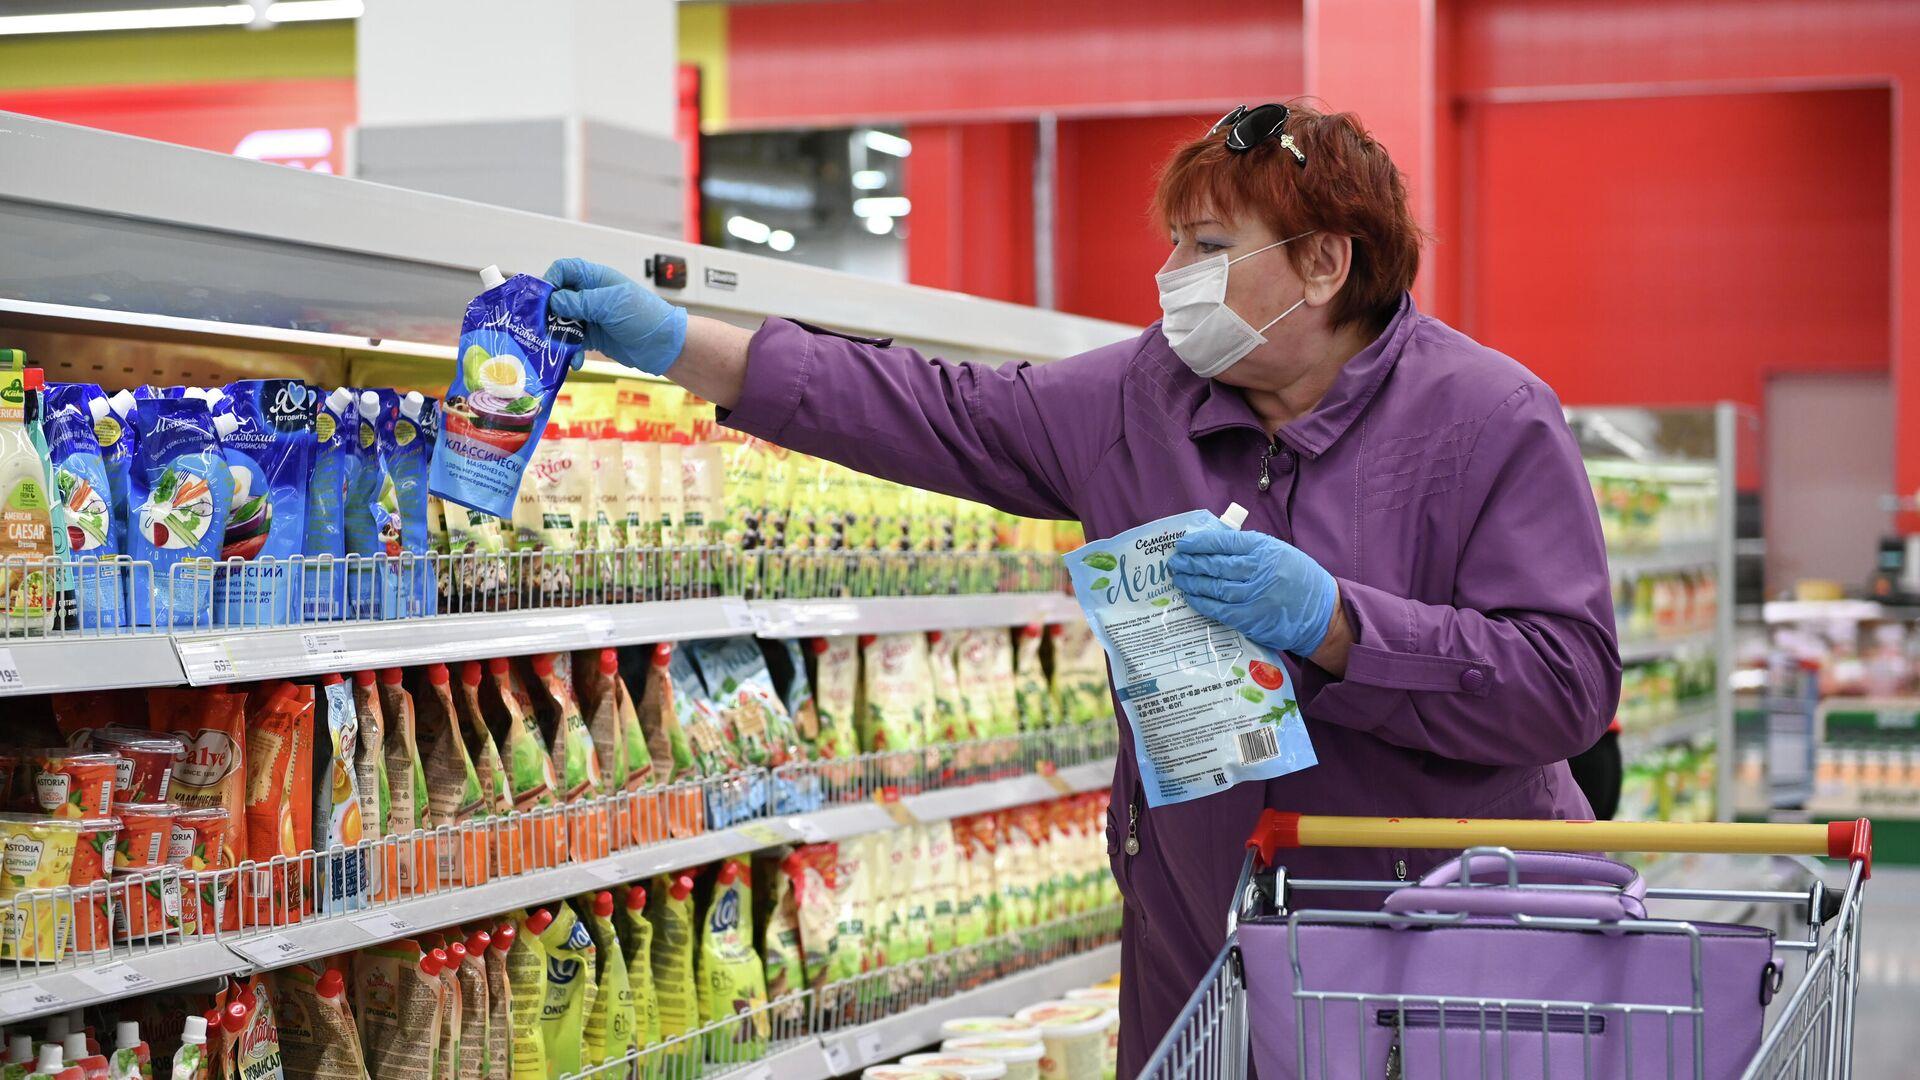 Женщина в супермаркете  - РИА Новости, 1920, 25.09.2021